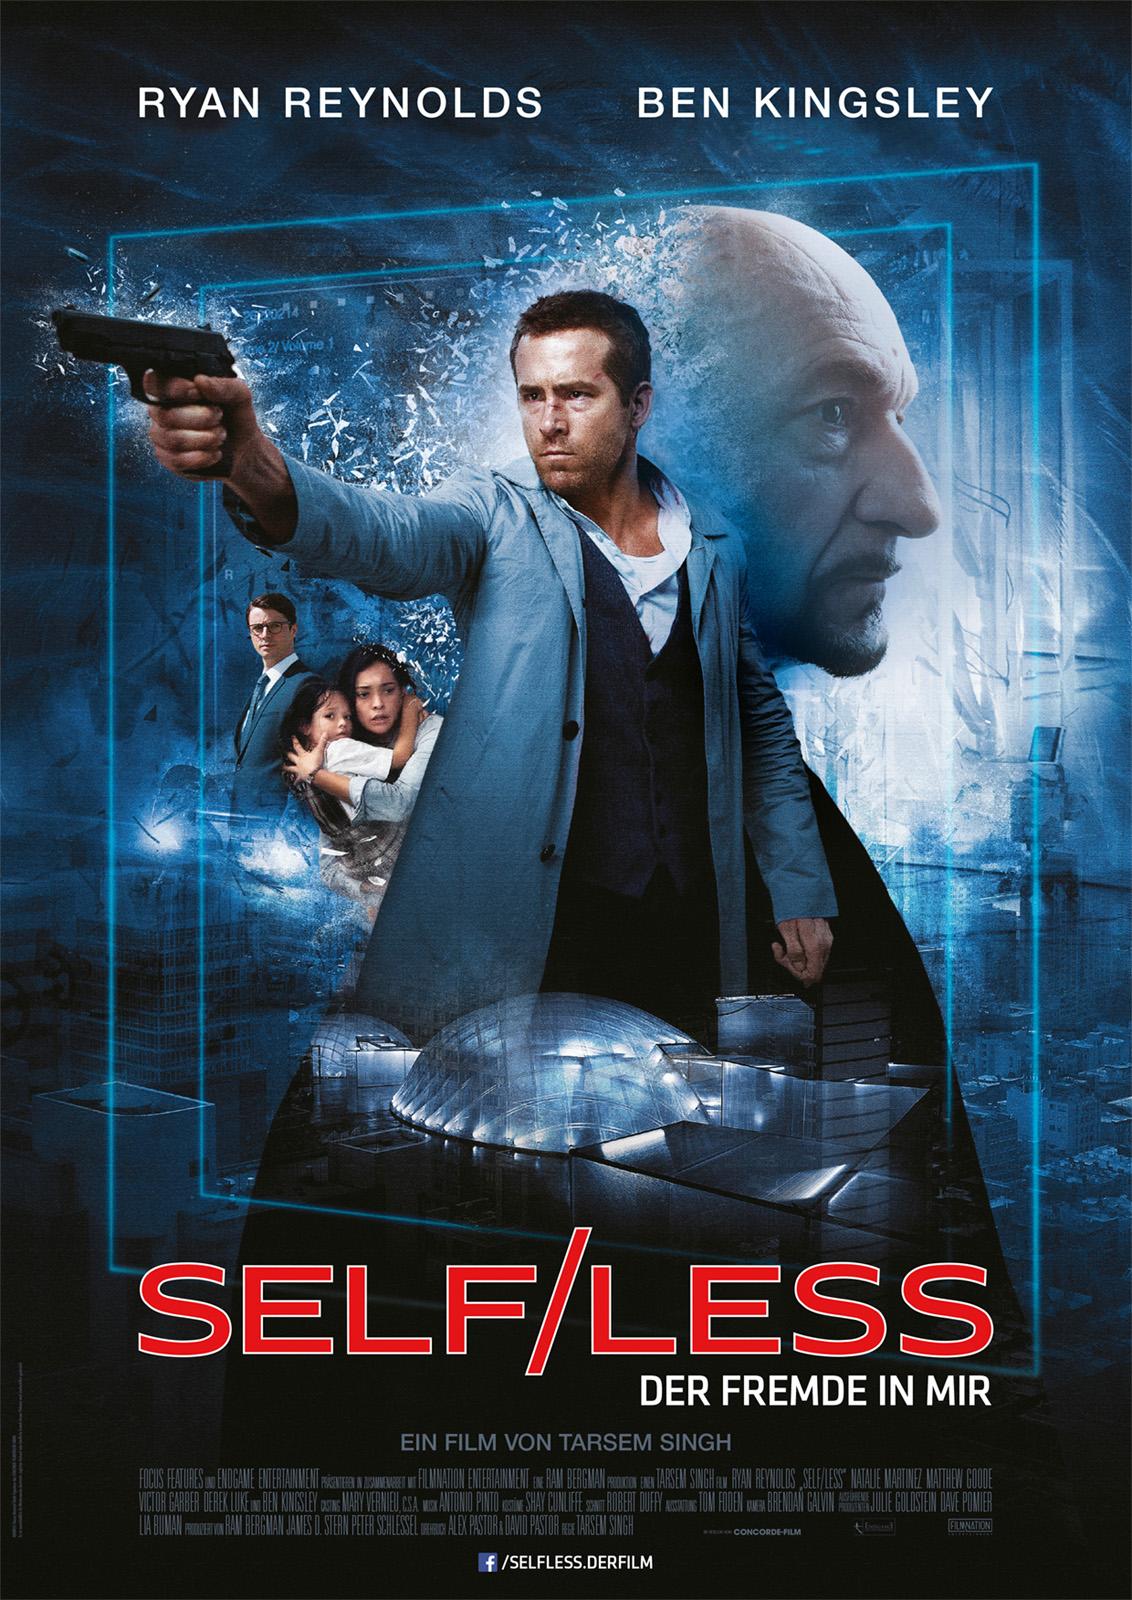 selfless – der fremde in mir